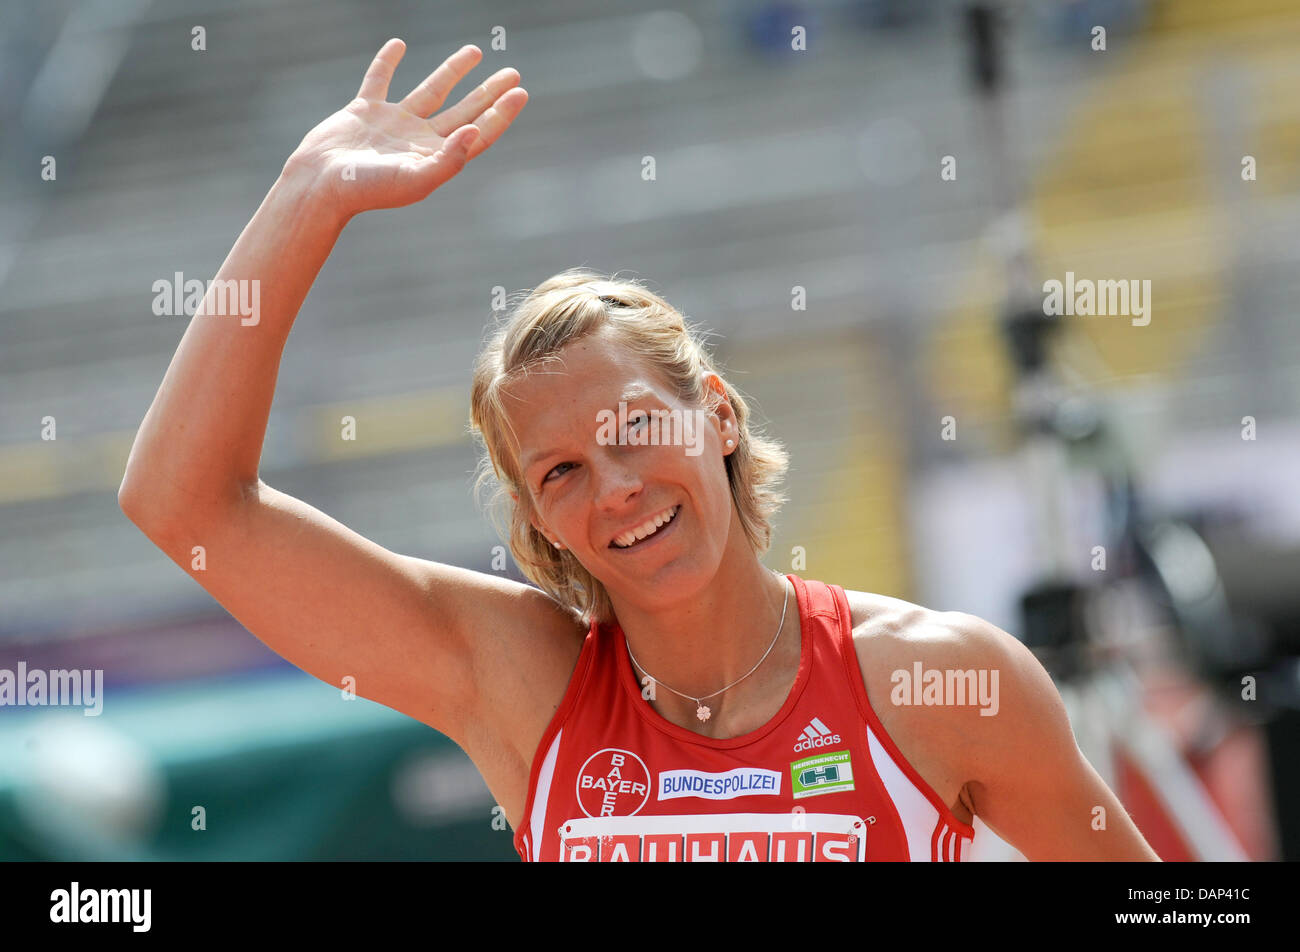 Finishing runner of 100 meter relay team of TSV Bayer 04 Leverkusen, Jennifer Oeser cheers about winning the German - Stock Image